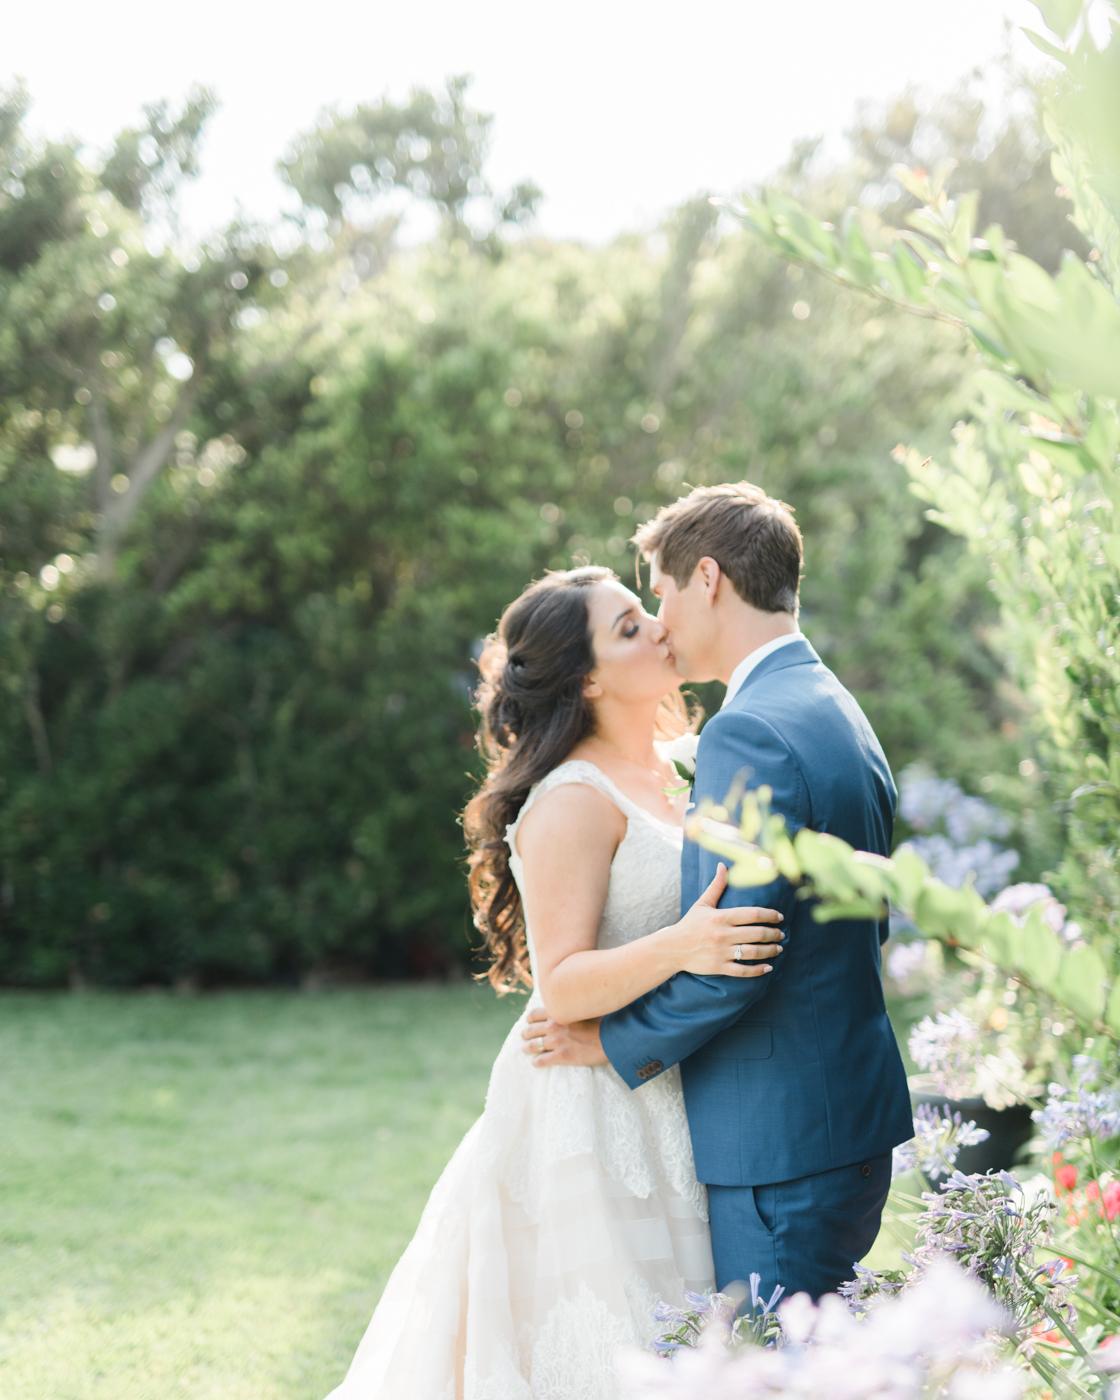 AKP_S&F_Malibu_Wedding_Fine_Art_Photography_Los_Angeles-39.jpg